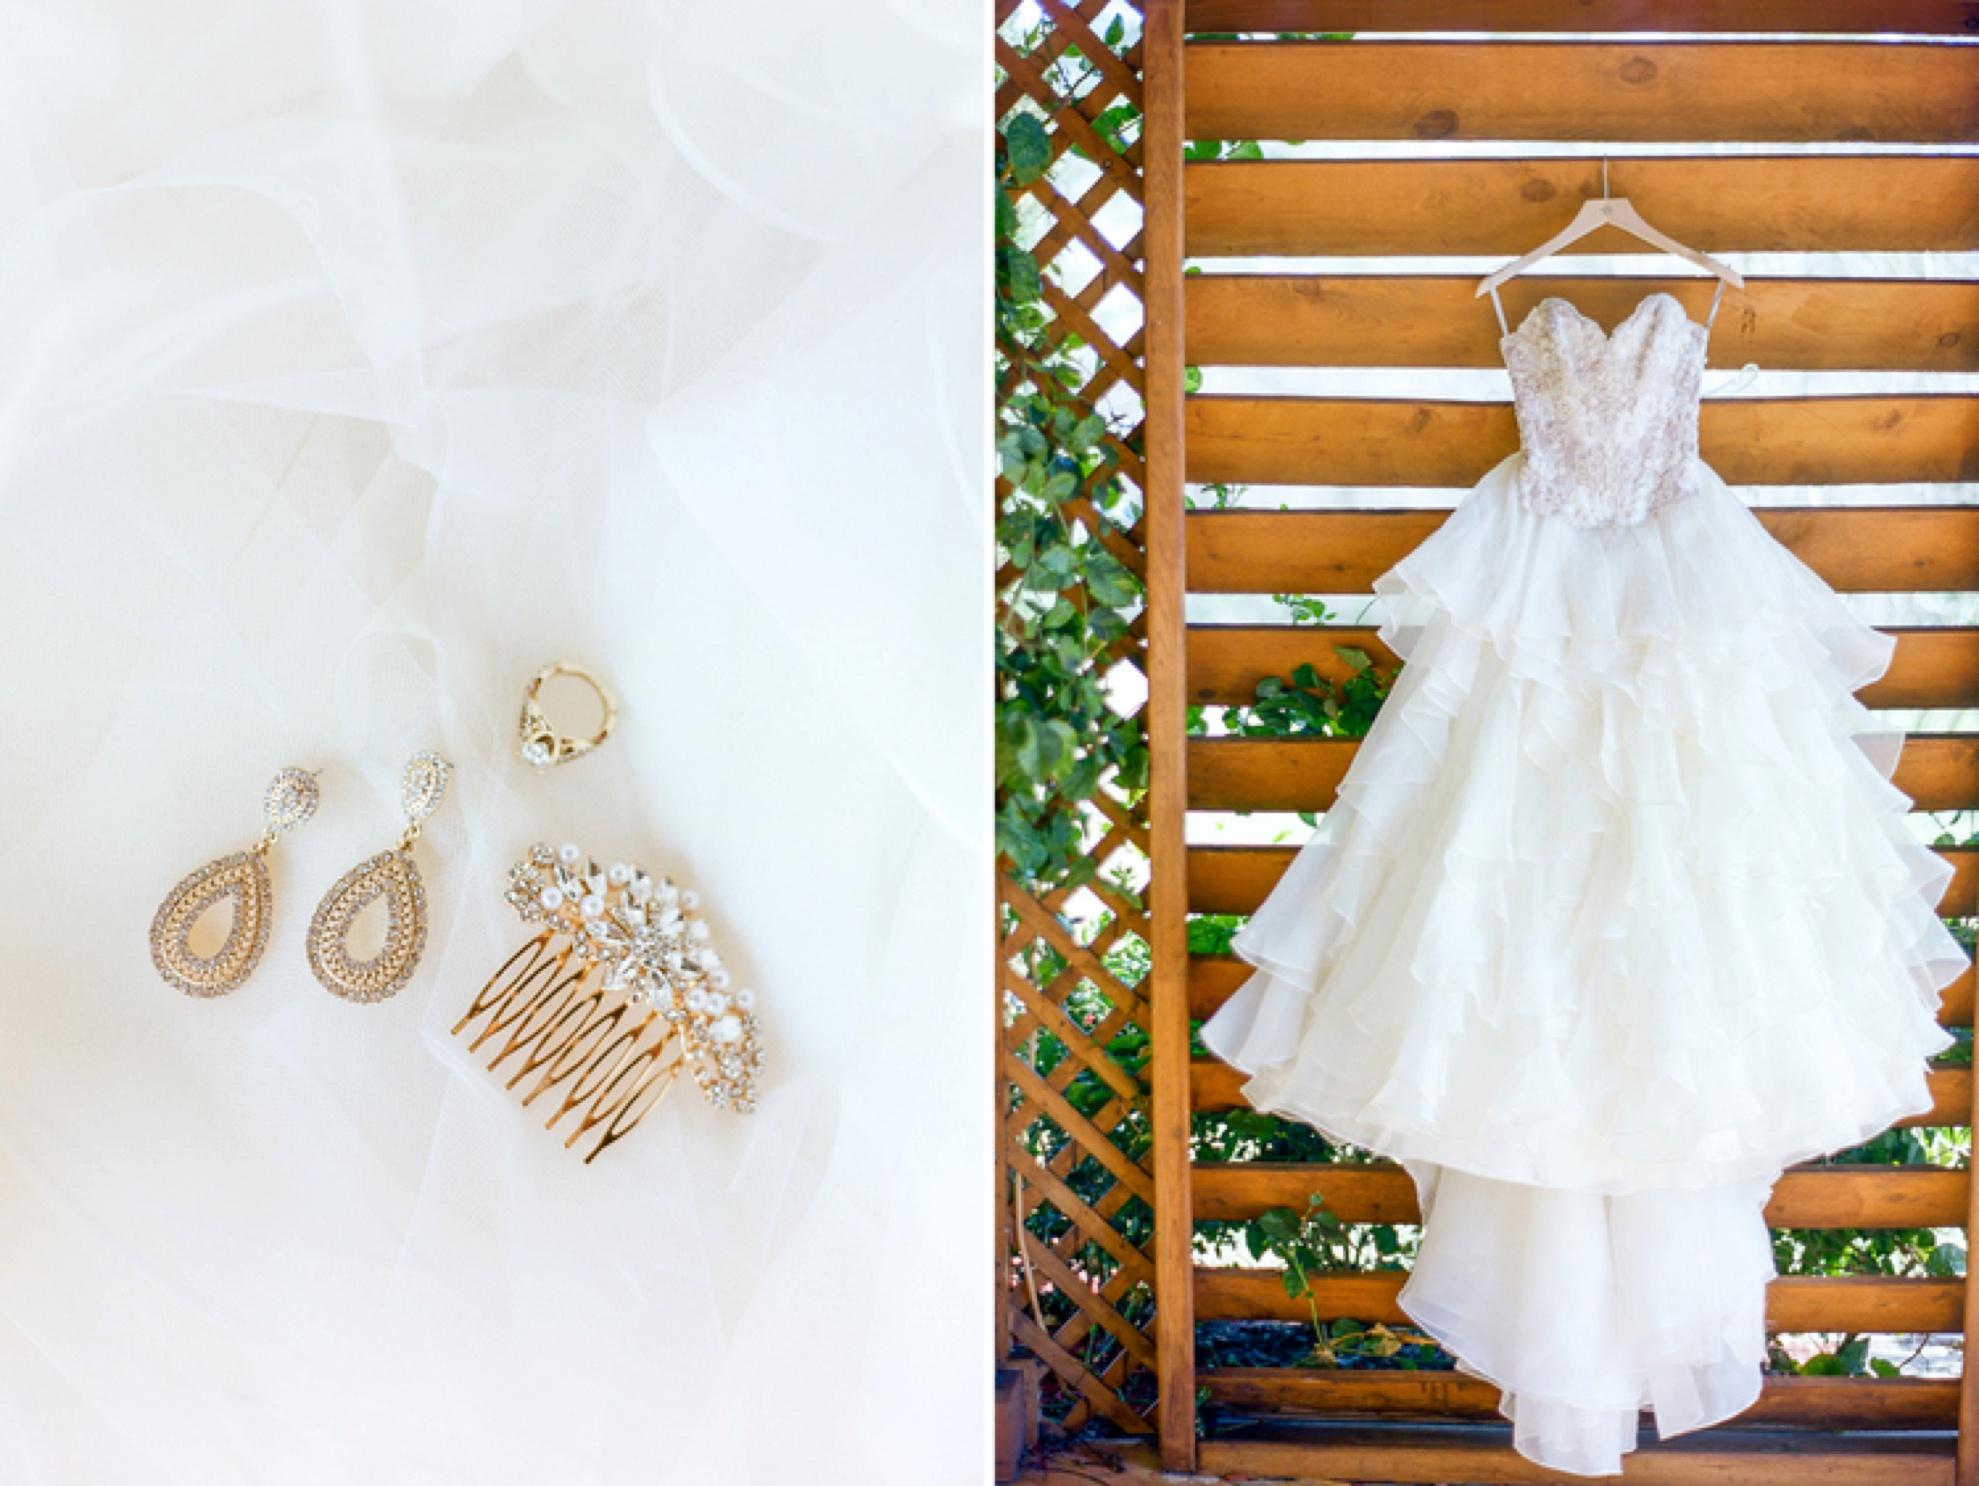 Tuscan-Courtyard-Wedding-Venue-Texas-City-Ceremony-Reception-Photographer-Dana-Fernandez-Photography-8.jpg